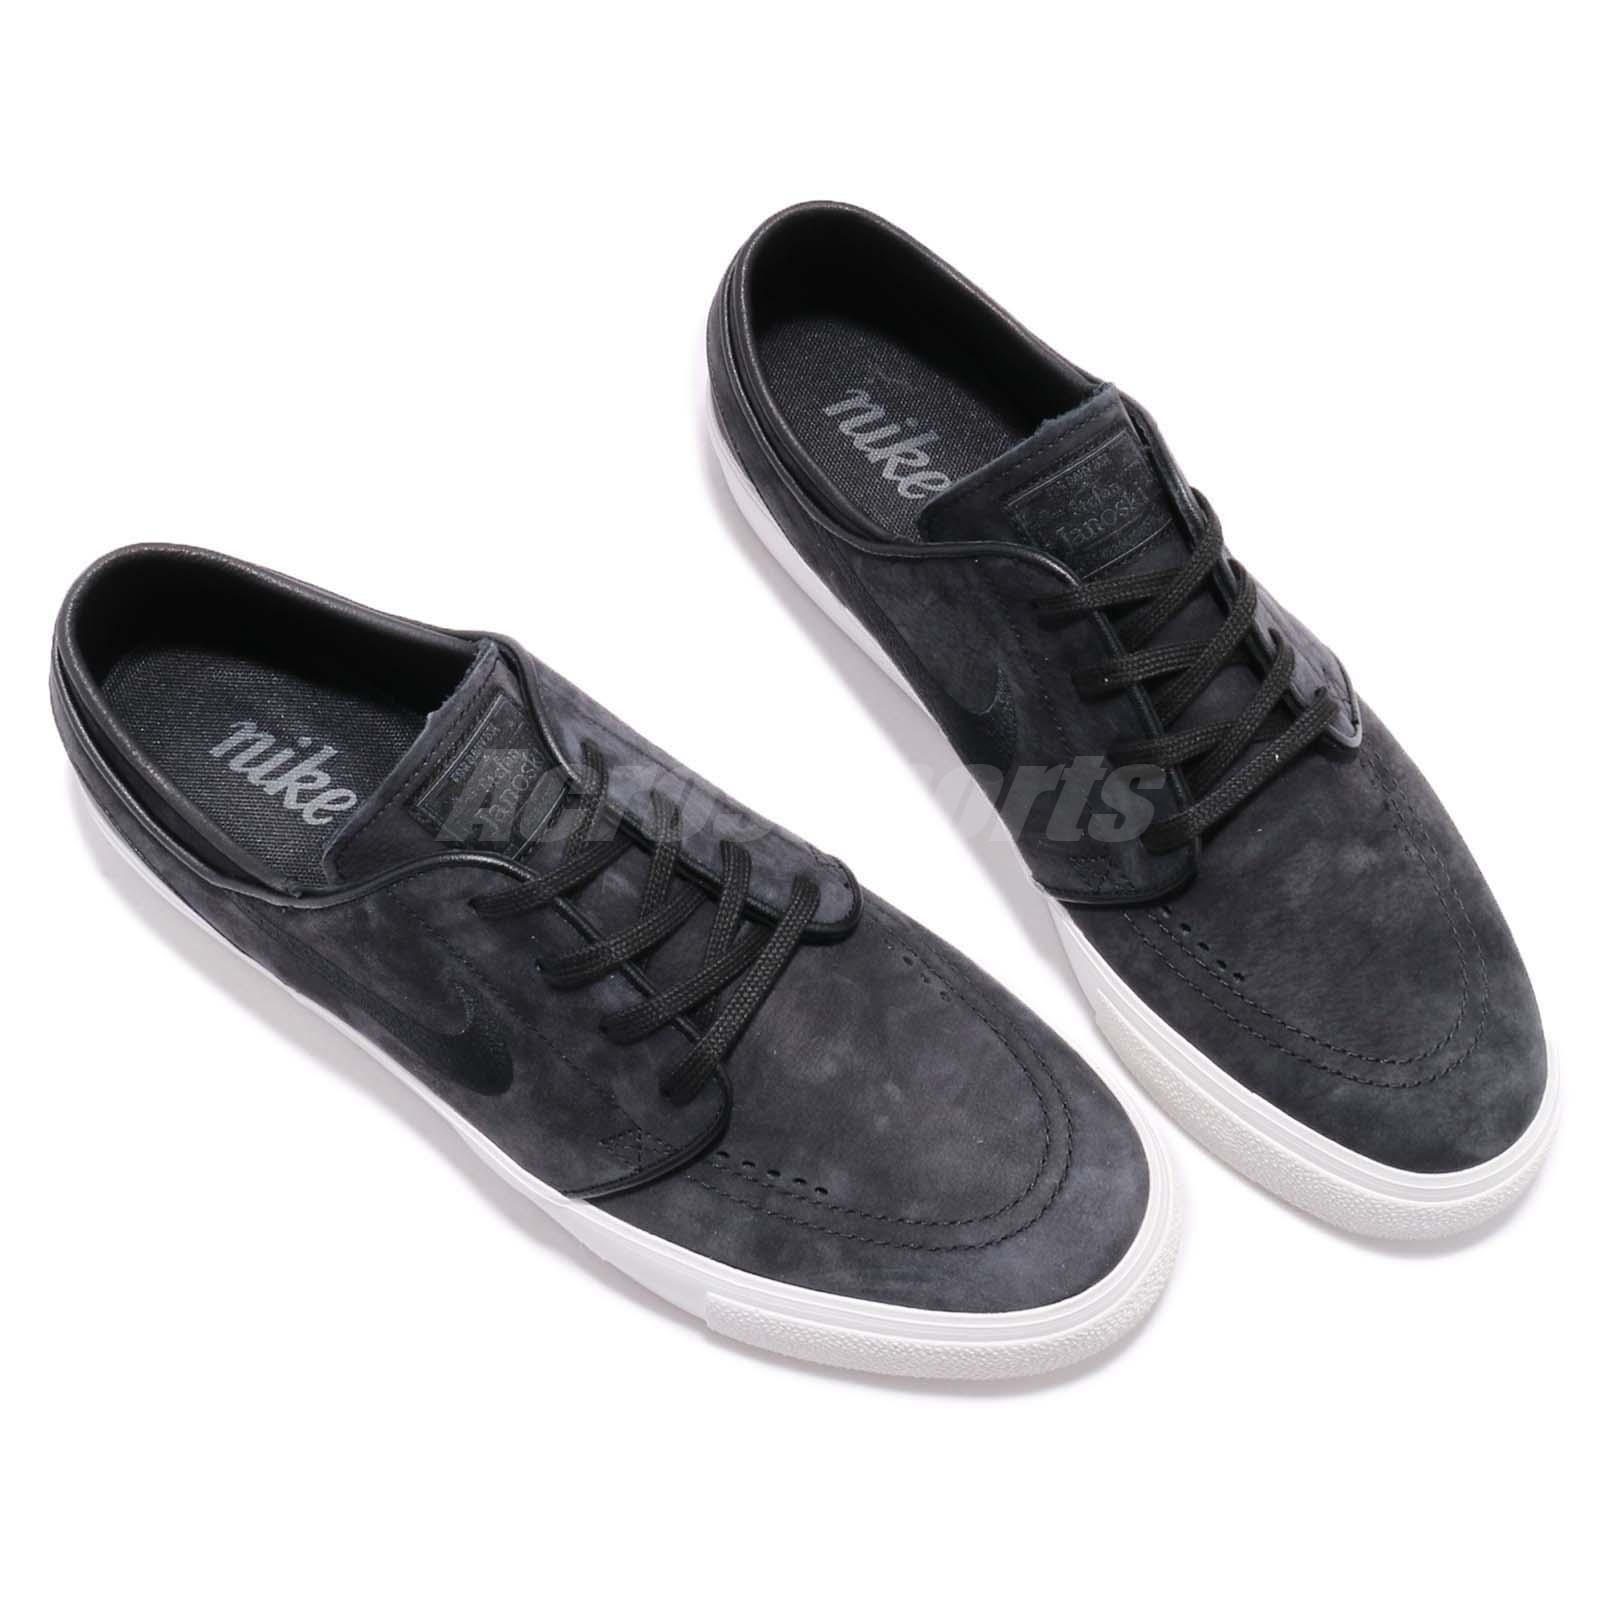 f4fd7d5578003 ... Nike SB Zoom Janoski HT Decon Black Summit White Men Skate B cheap air  sneaker 9c51b ...